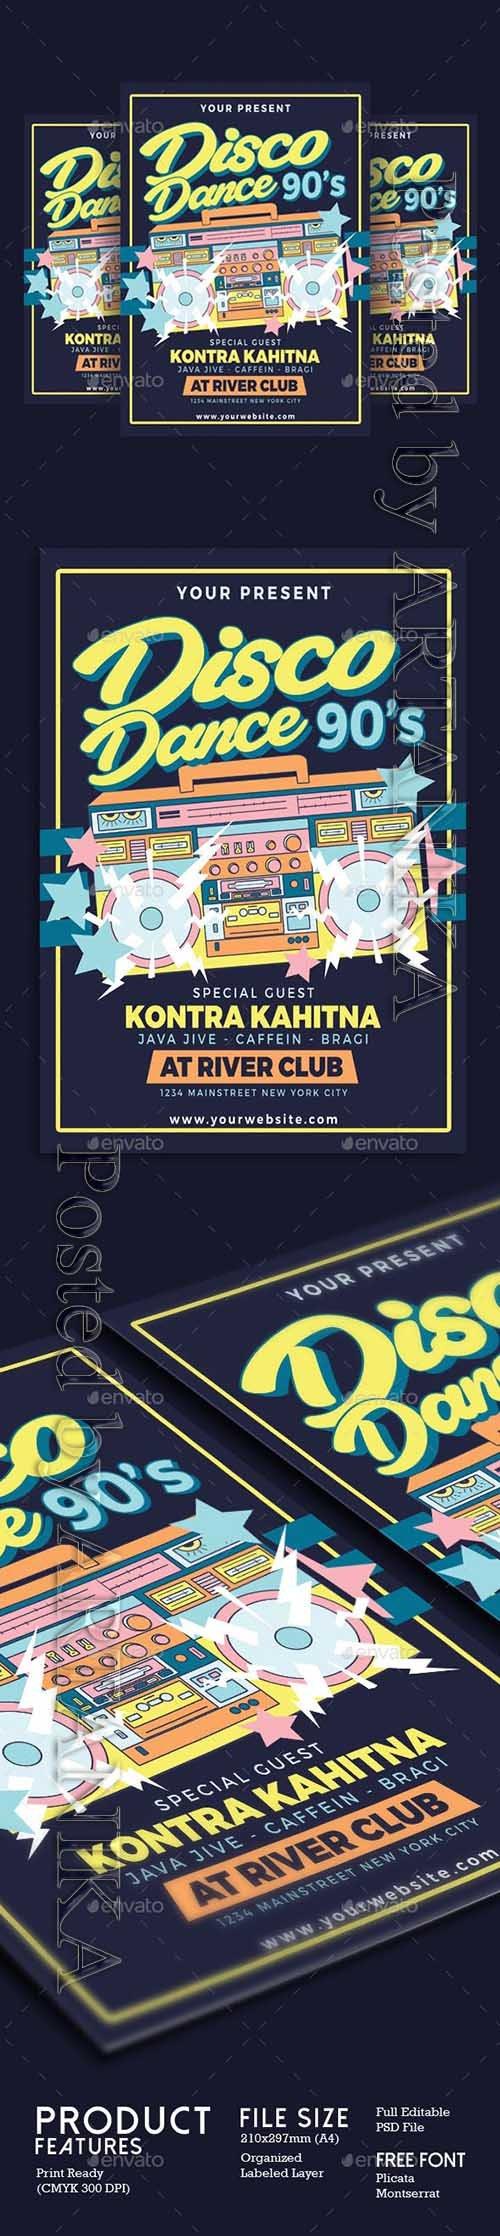 Graphicriver - Disco Dance 90's Party 19261200